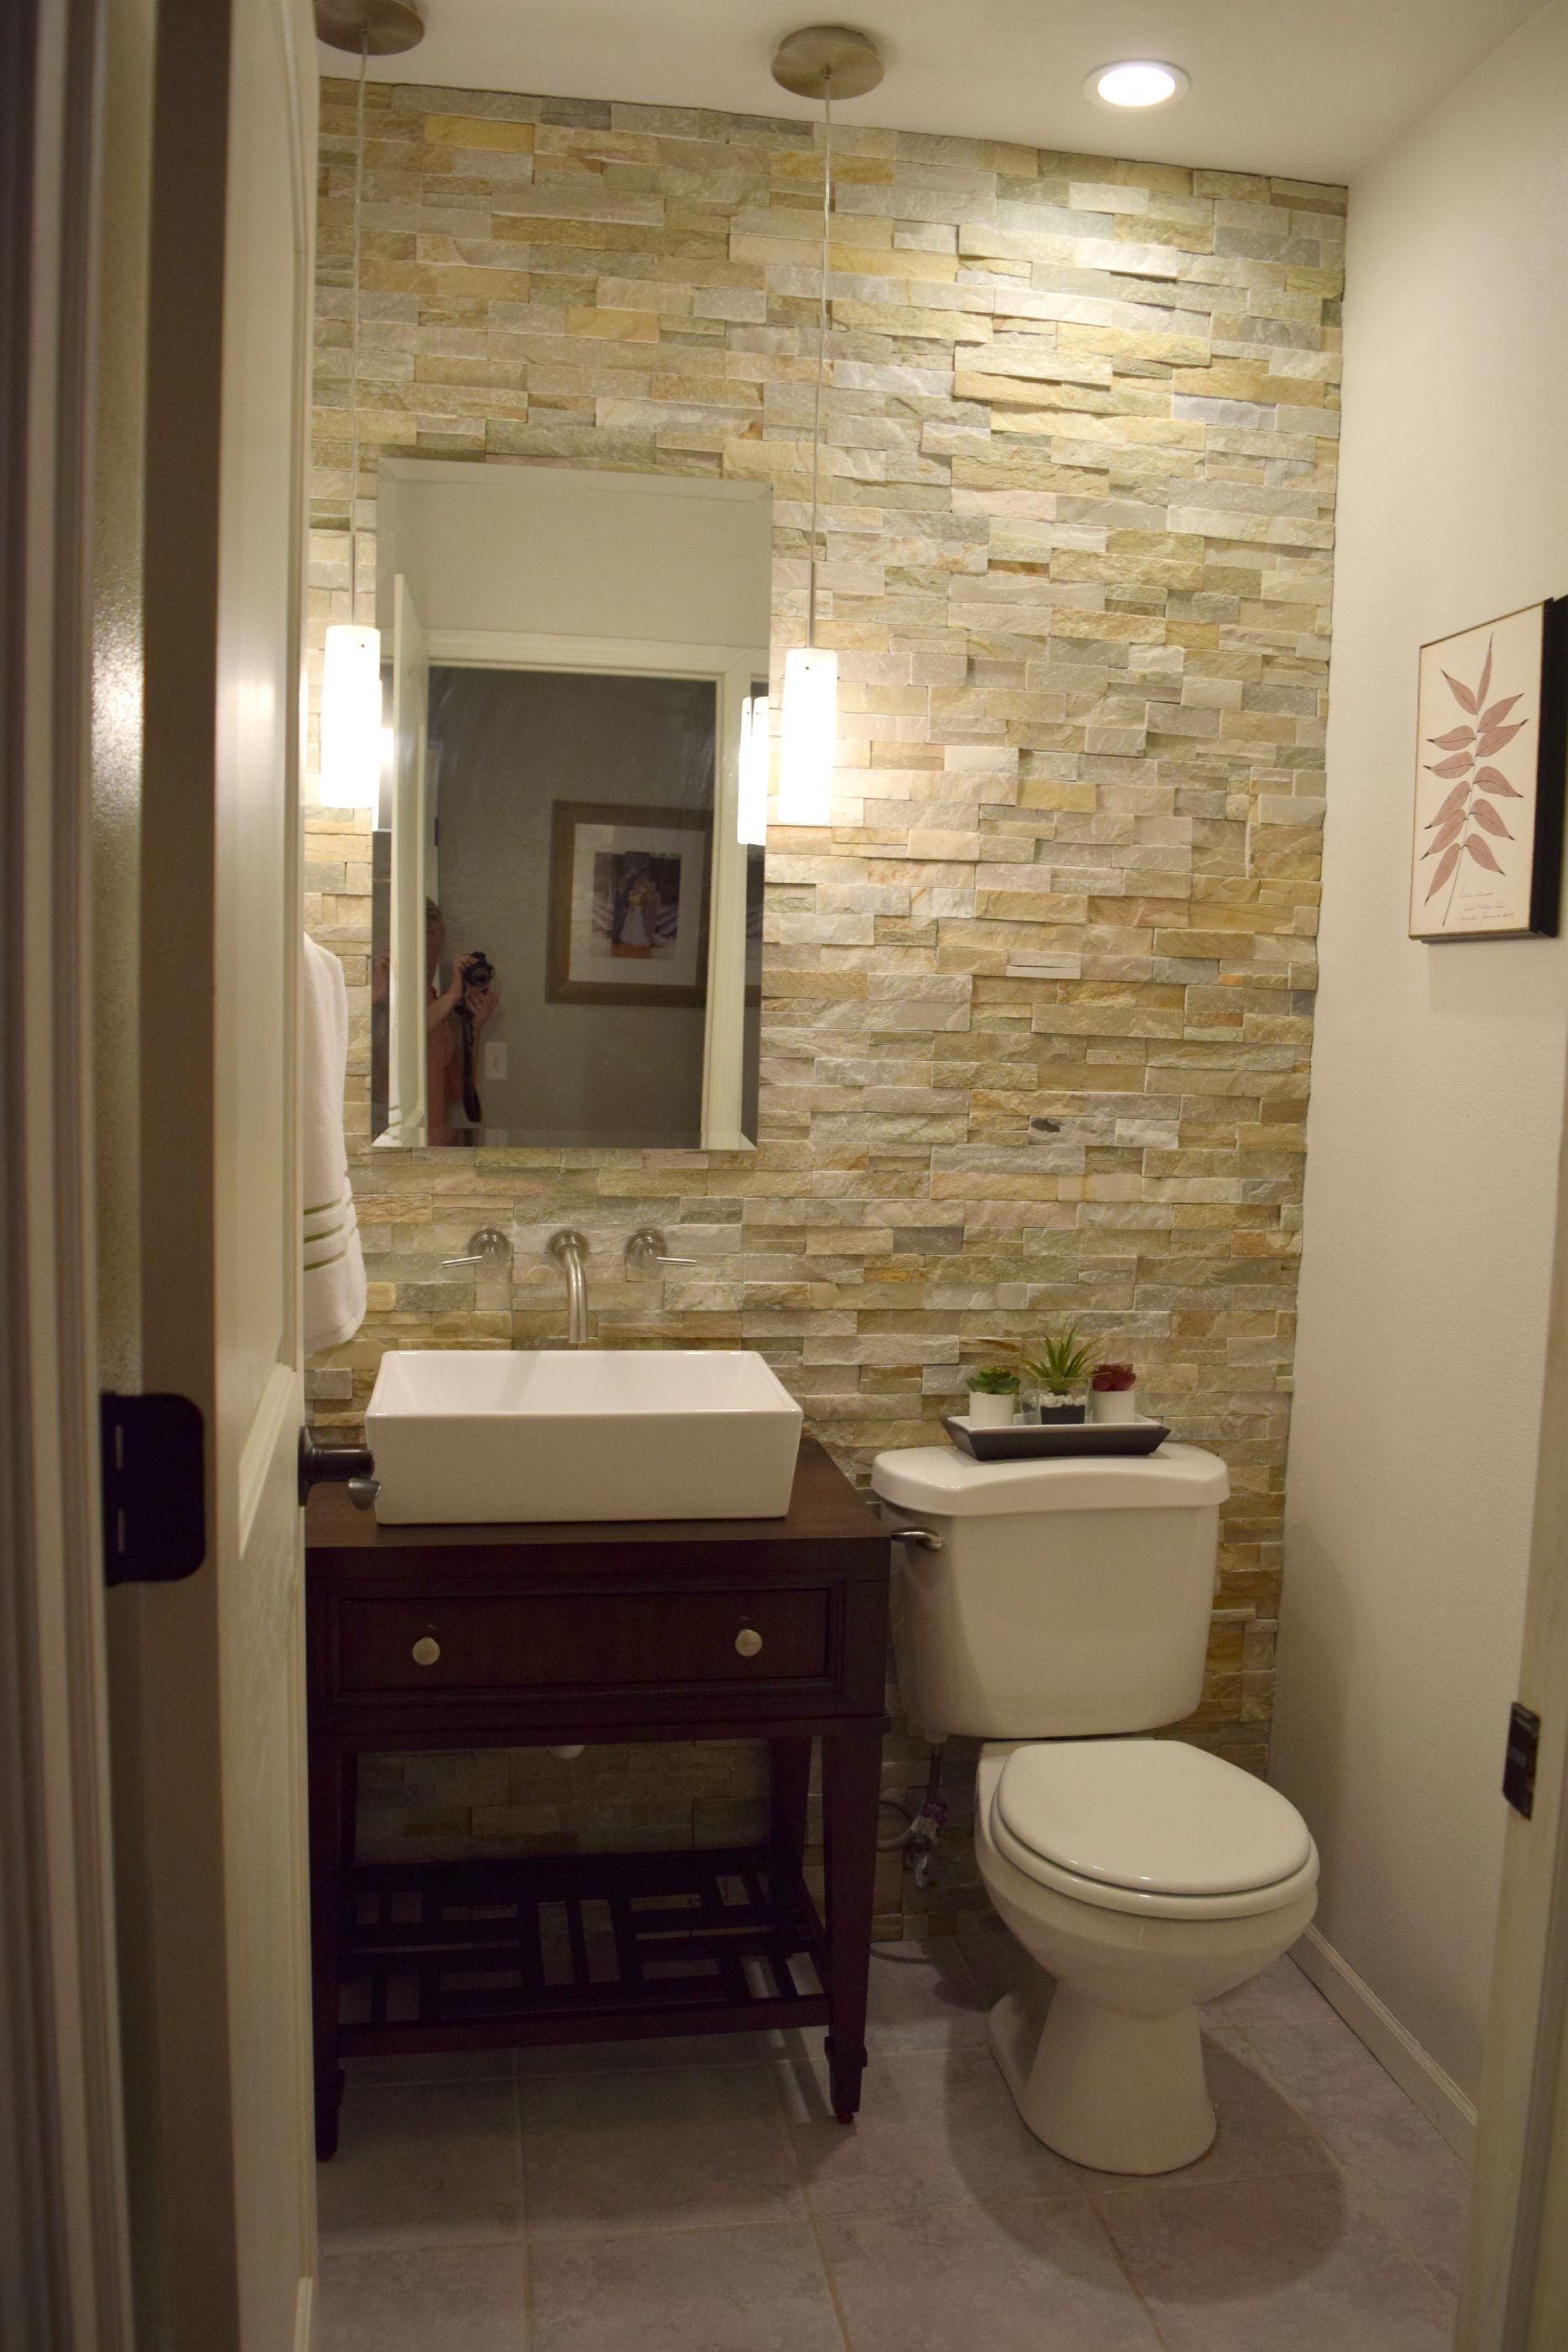 Dsc 08672 Jpg 1 867 2 800 Pixels Guest Bathroom Small Half Bath